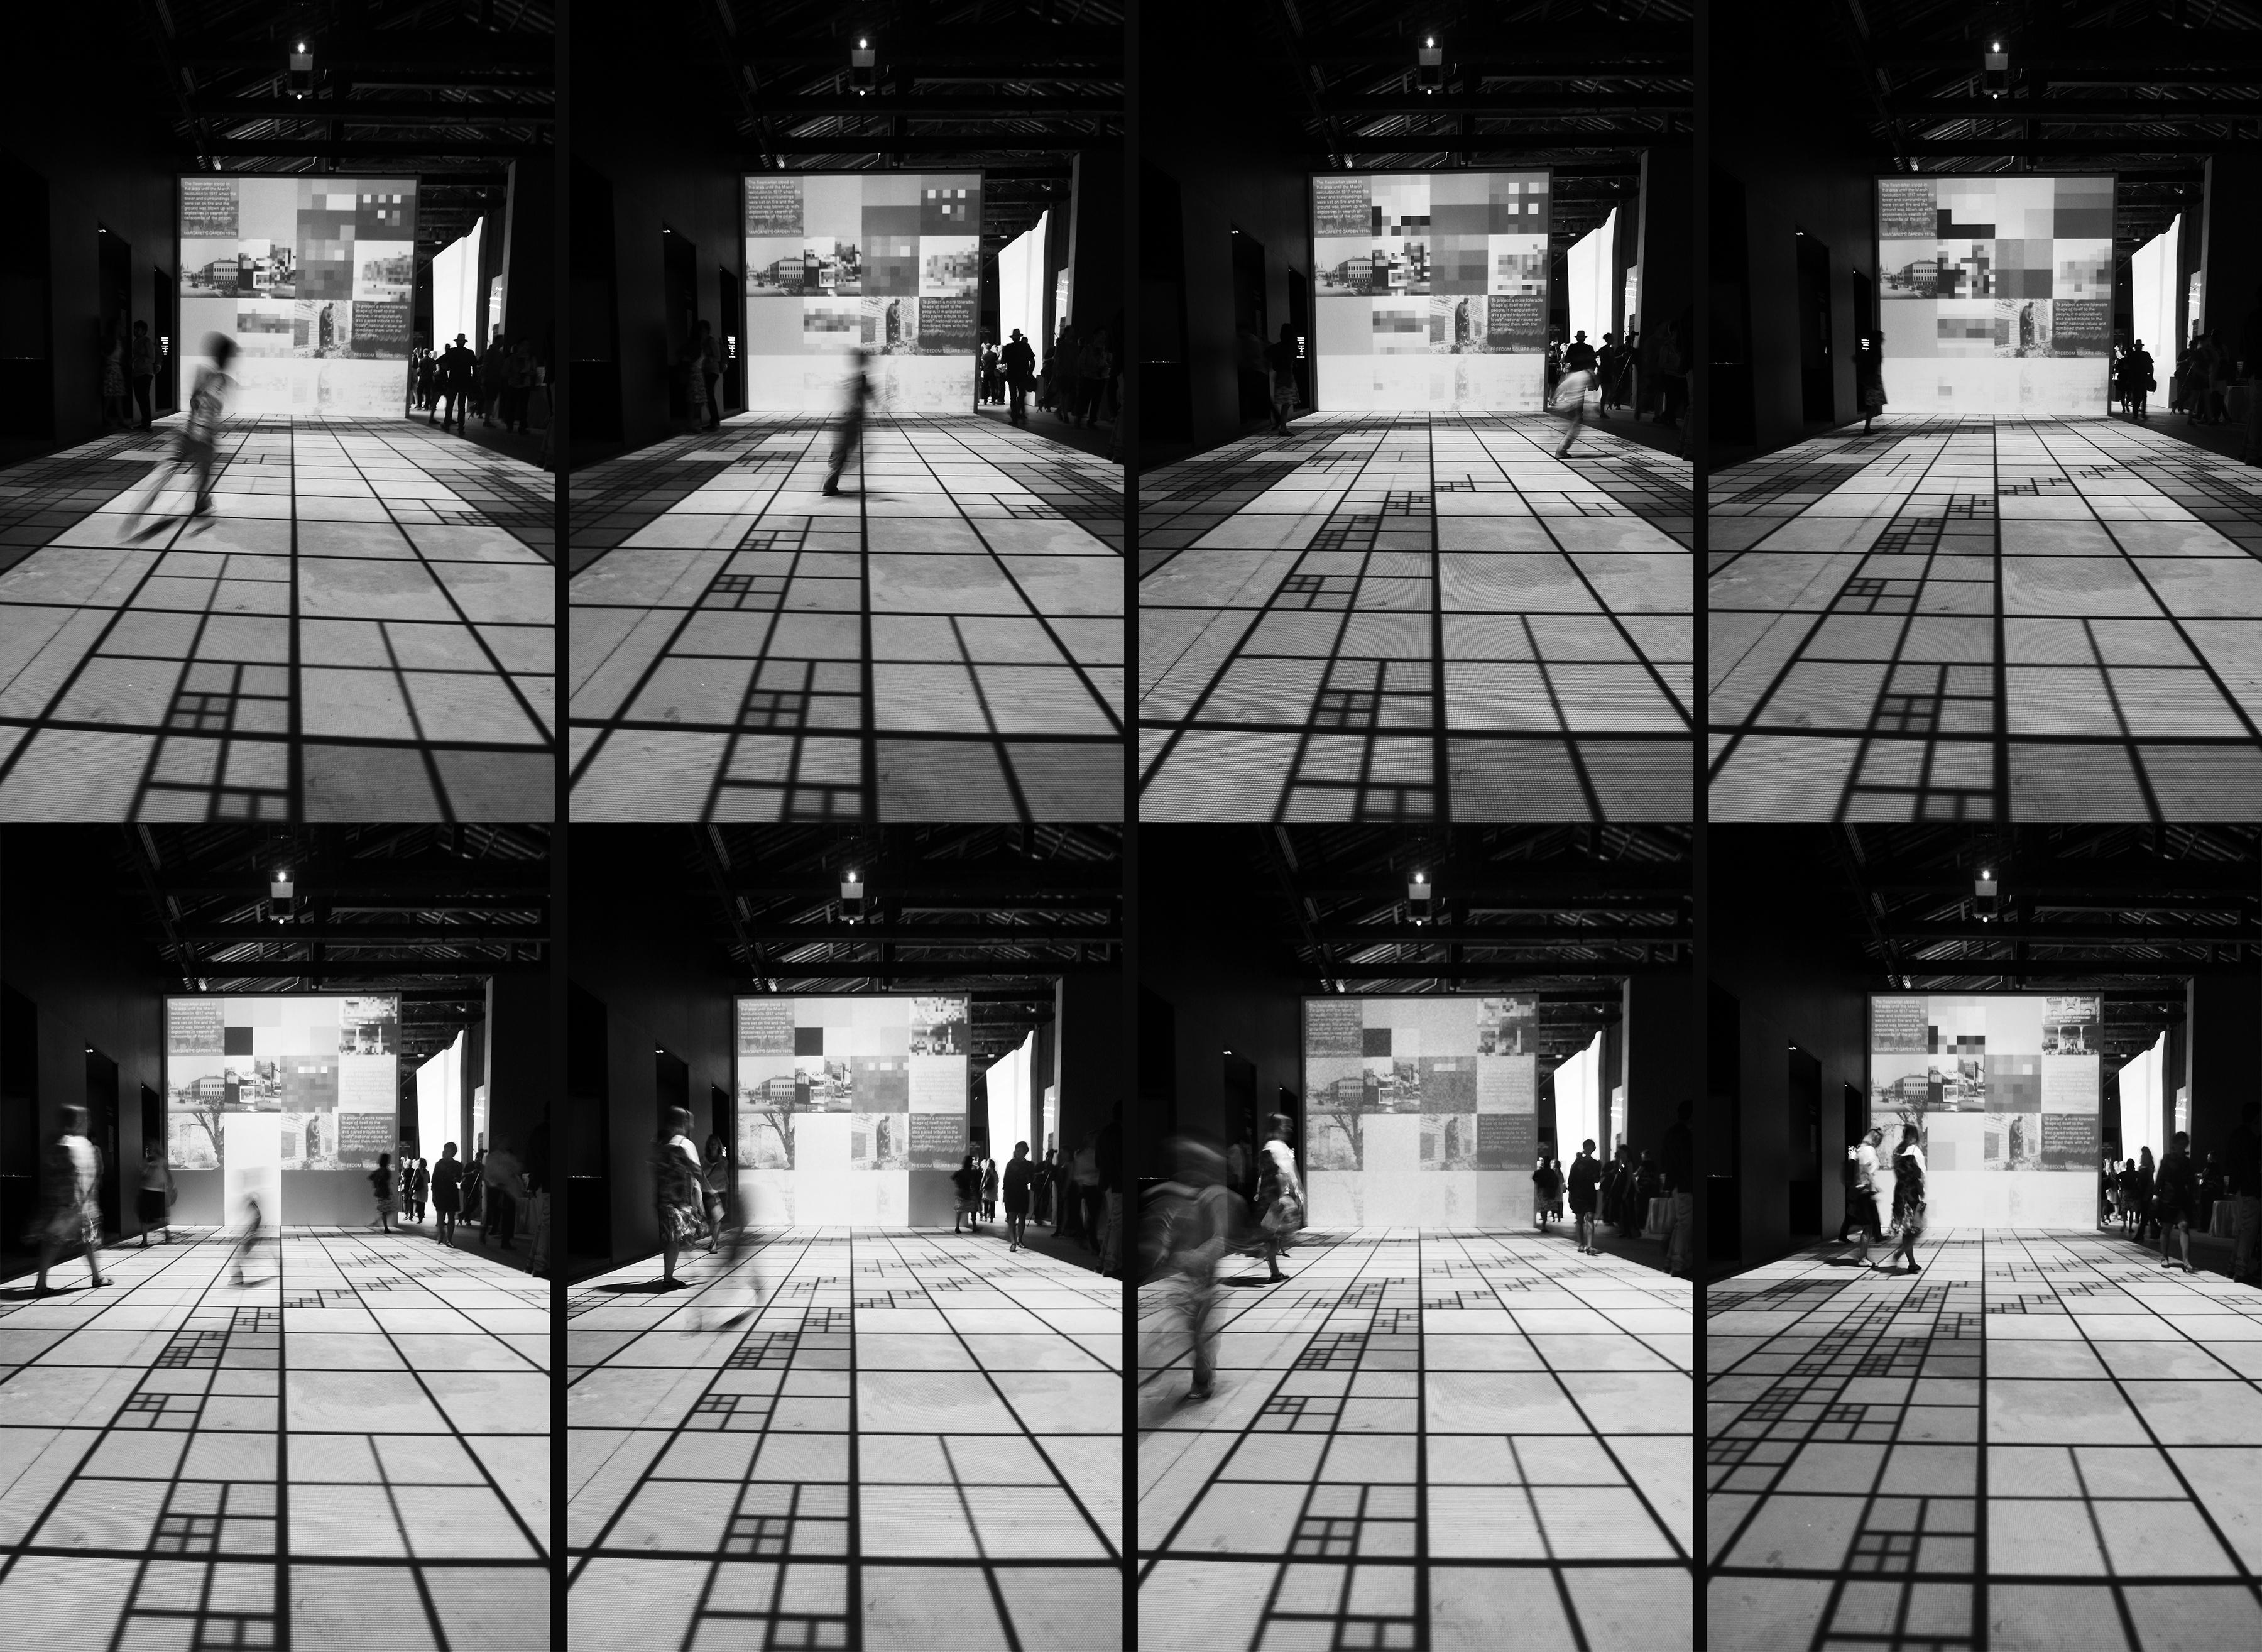 _005_Image_by_Johan Tali